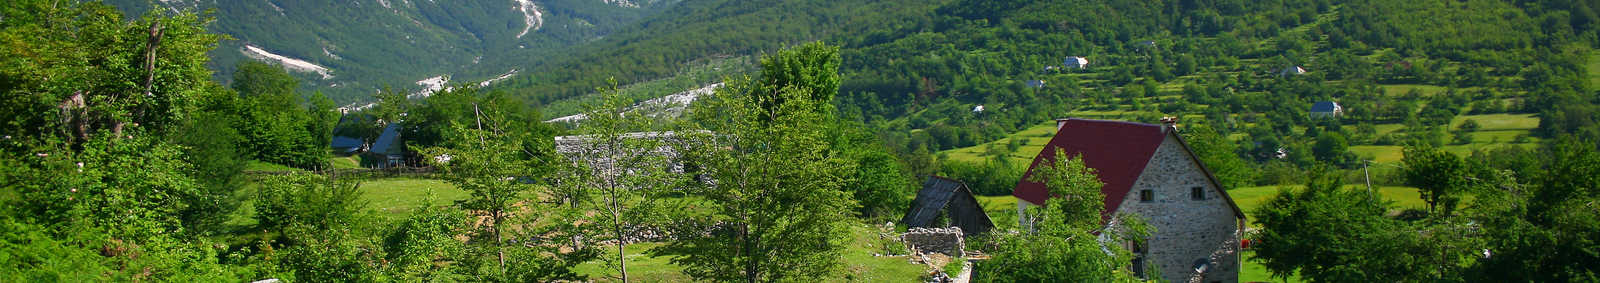 Theth Valley, Albania